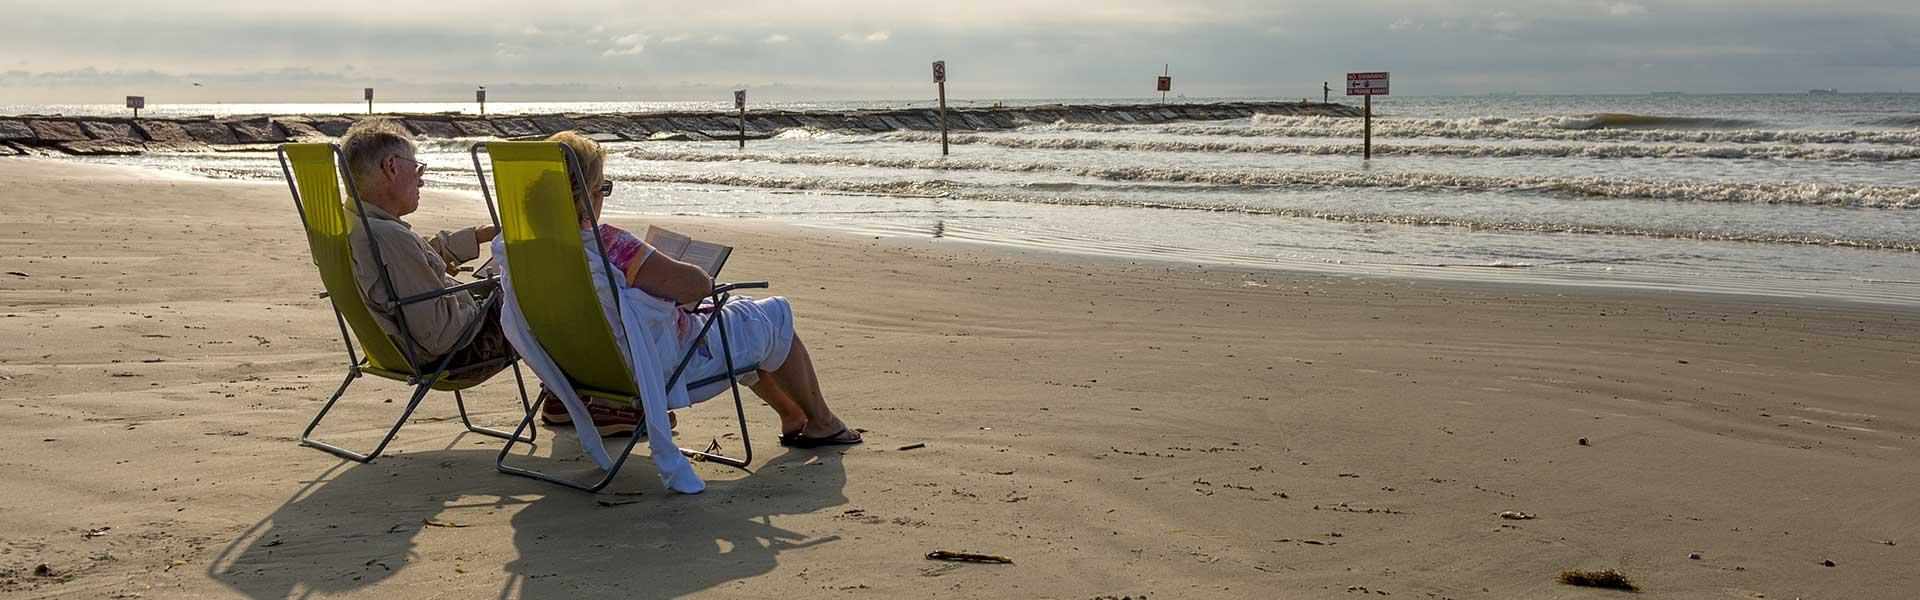 Couple Beach Chairs